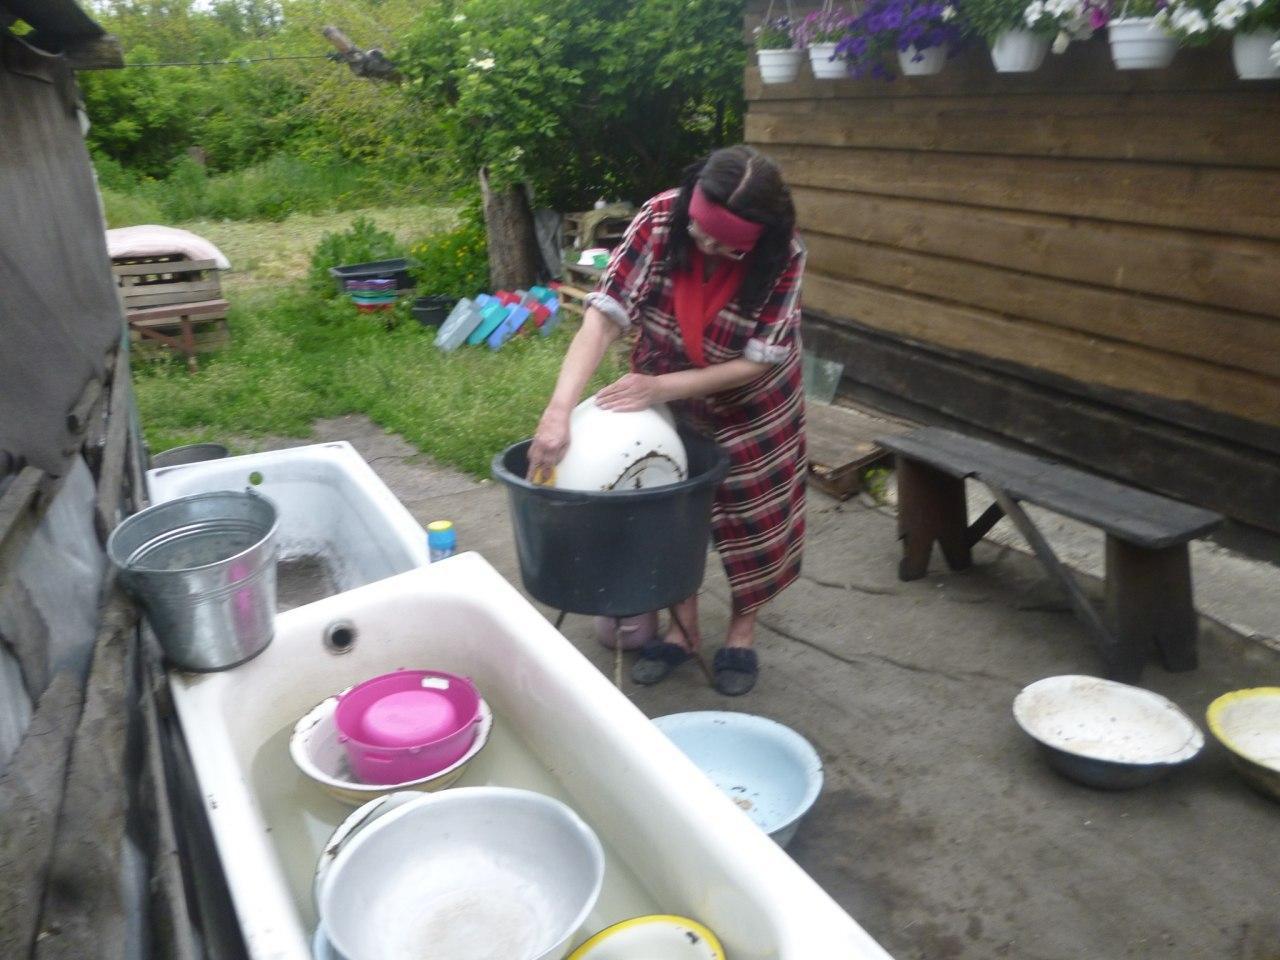 переселенка з Донецька забрала з собою сотню тварин